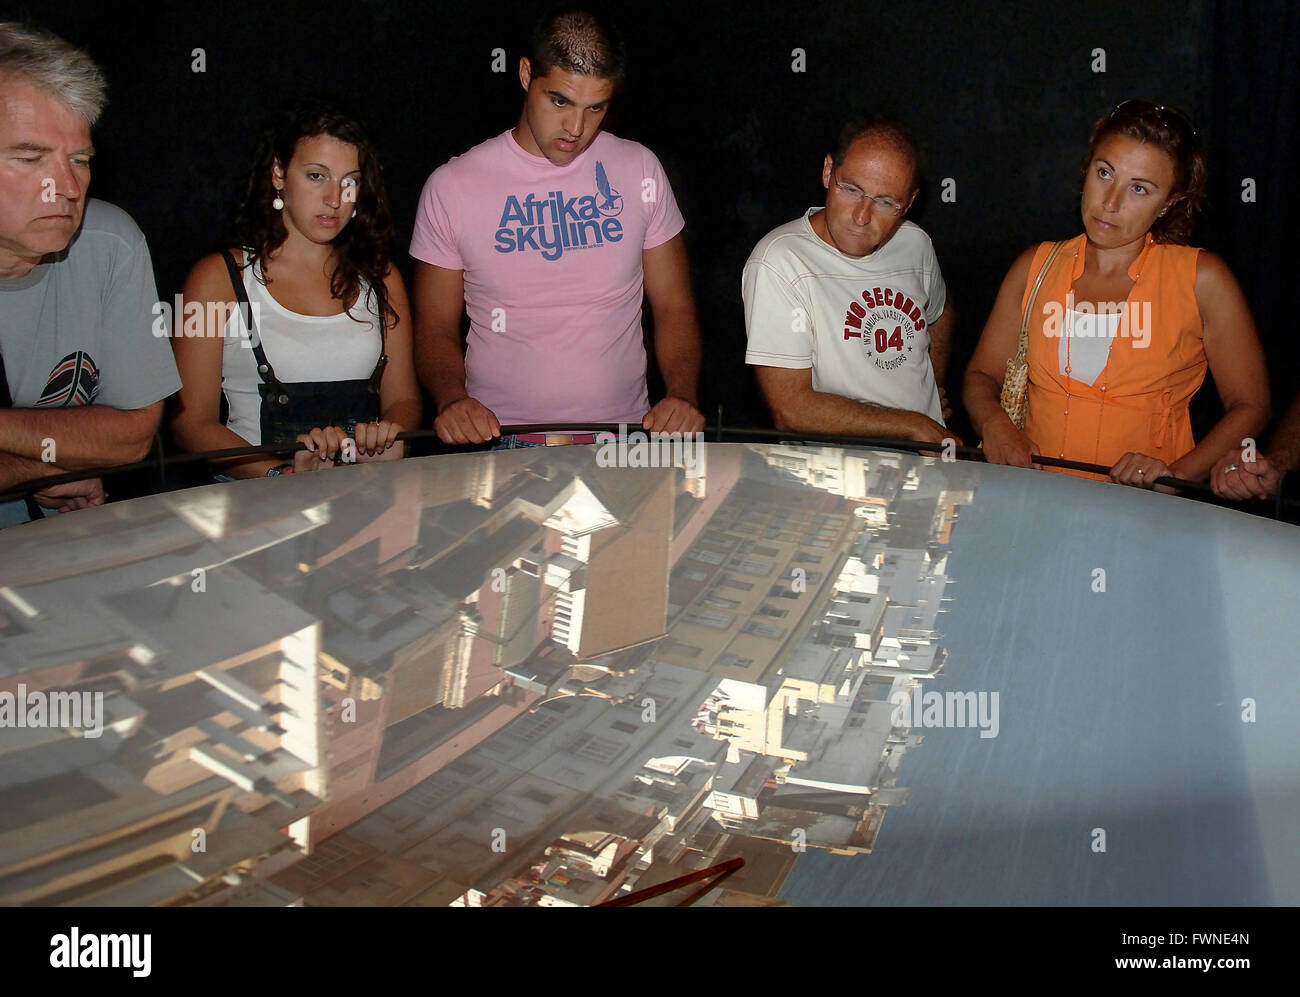 Tavira Turm, obskure Kamera, Cádiz, Region Andalusien, Spanien, Europa Stockfoto